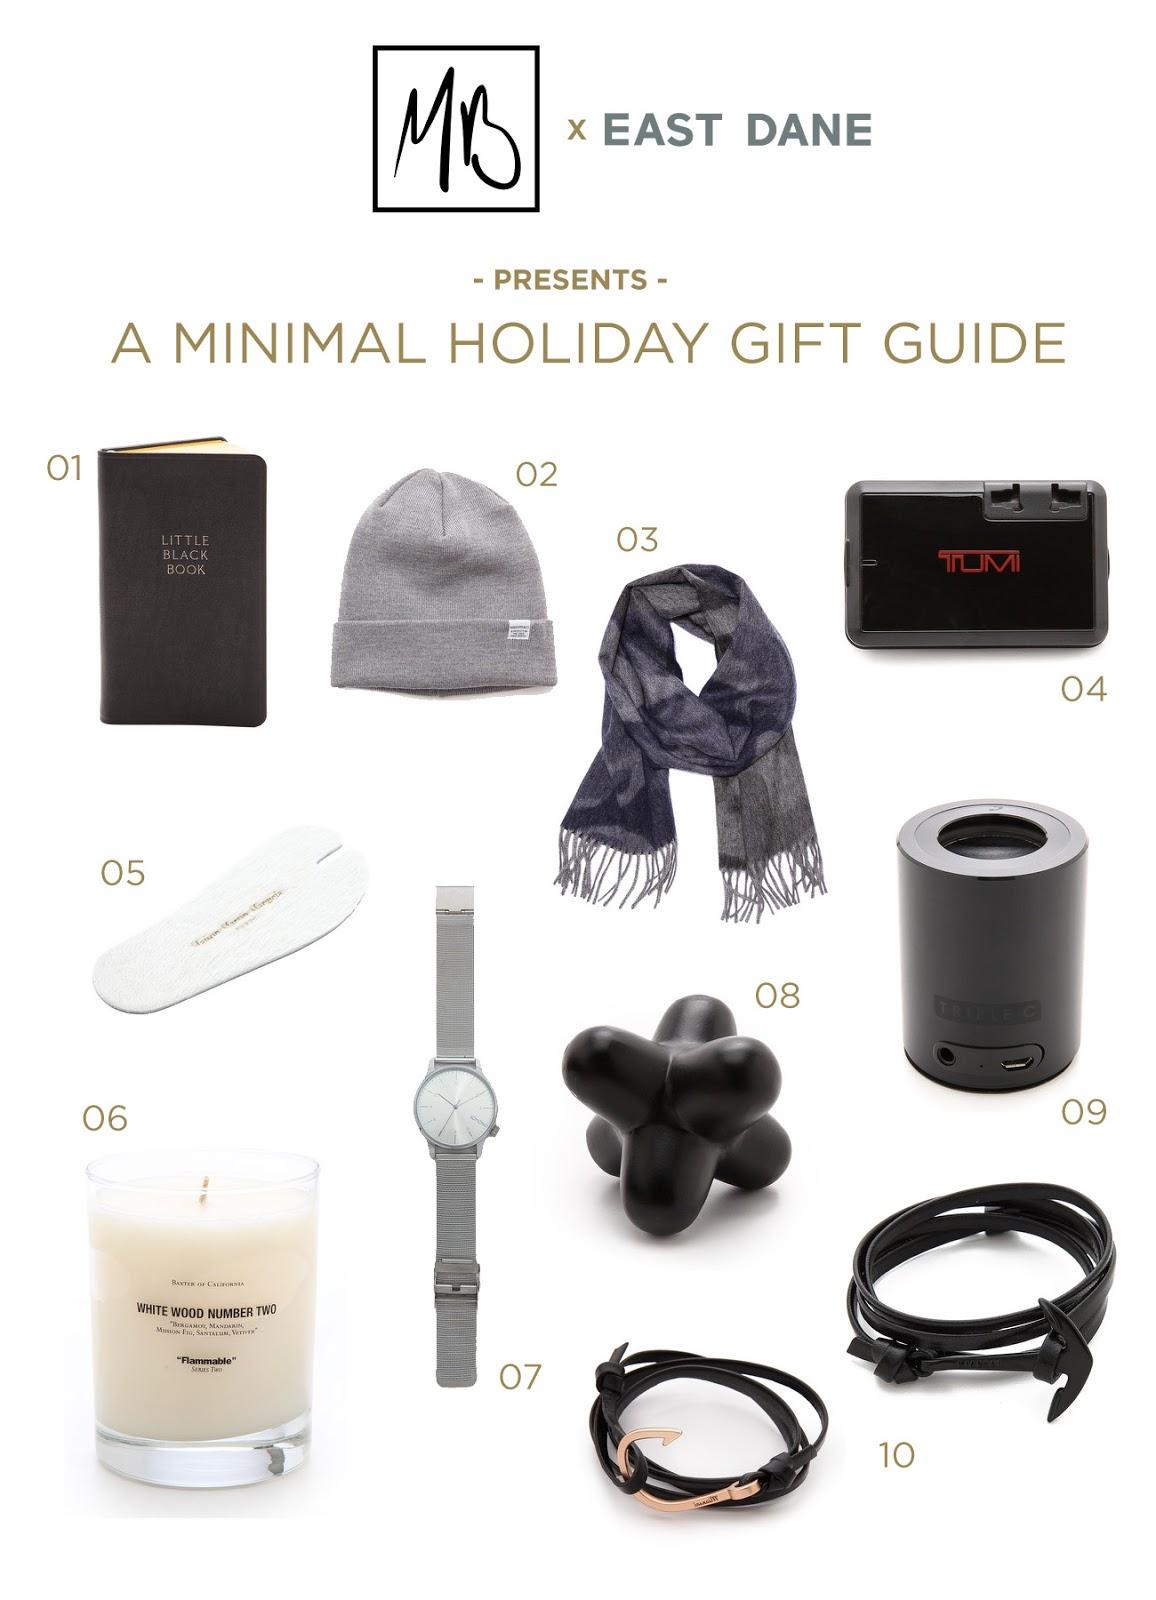 mybelonging-east-dane-gift-guide-giveaway.jpg